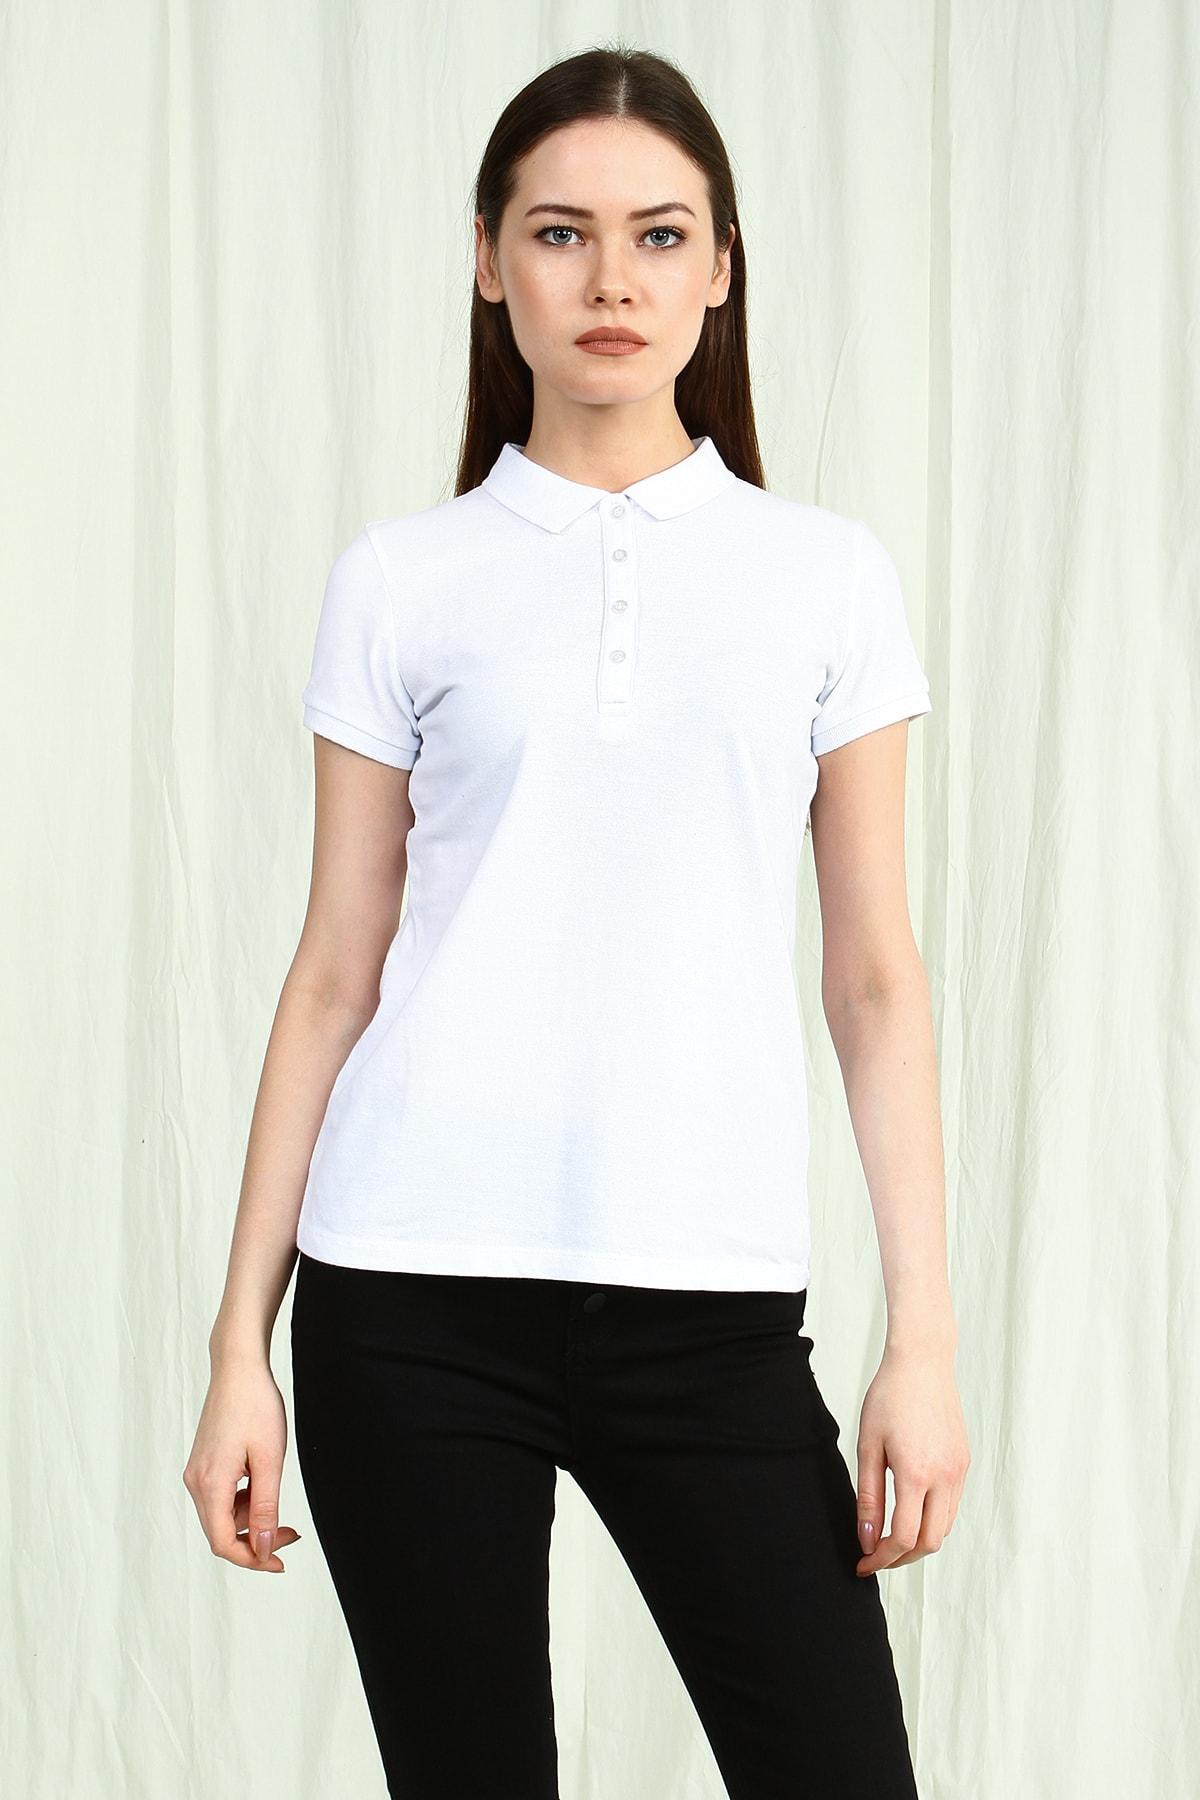 Collezione Beyaz Polo Yaka Kısa Kollu Basic Kadın Tshirt 1